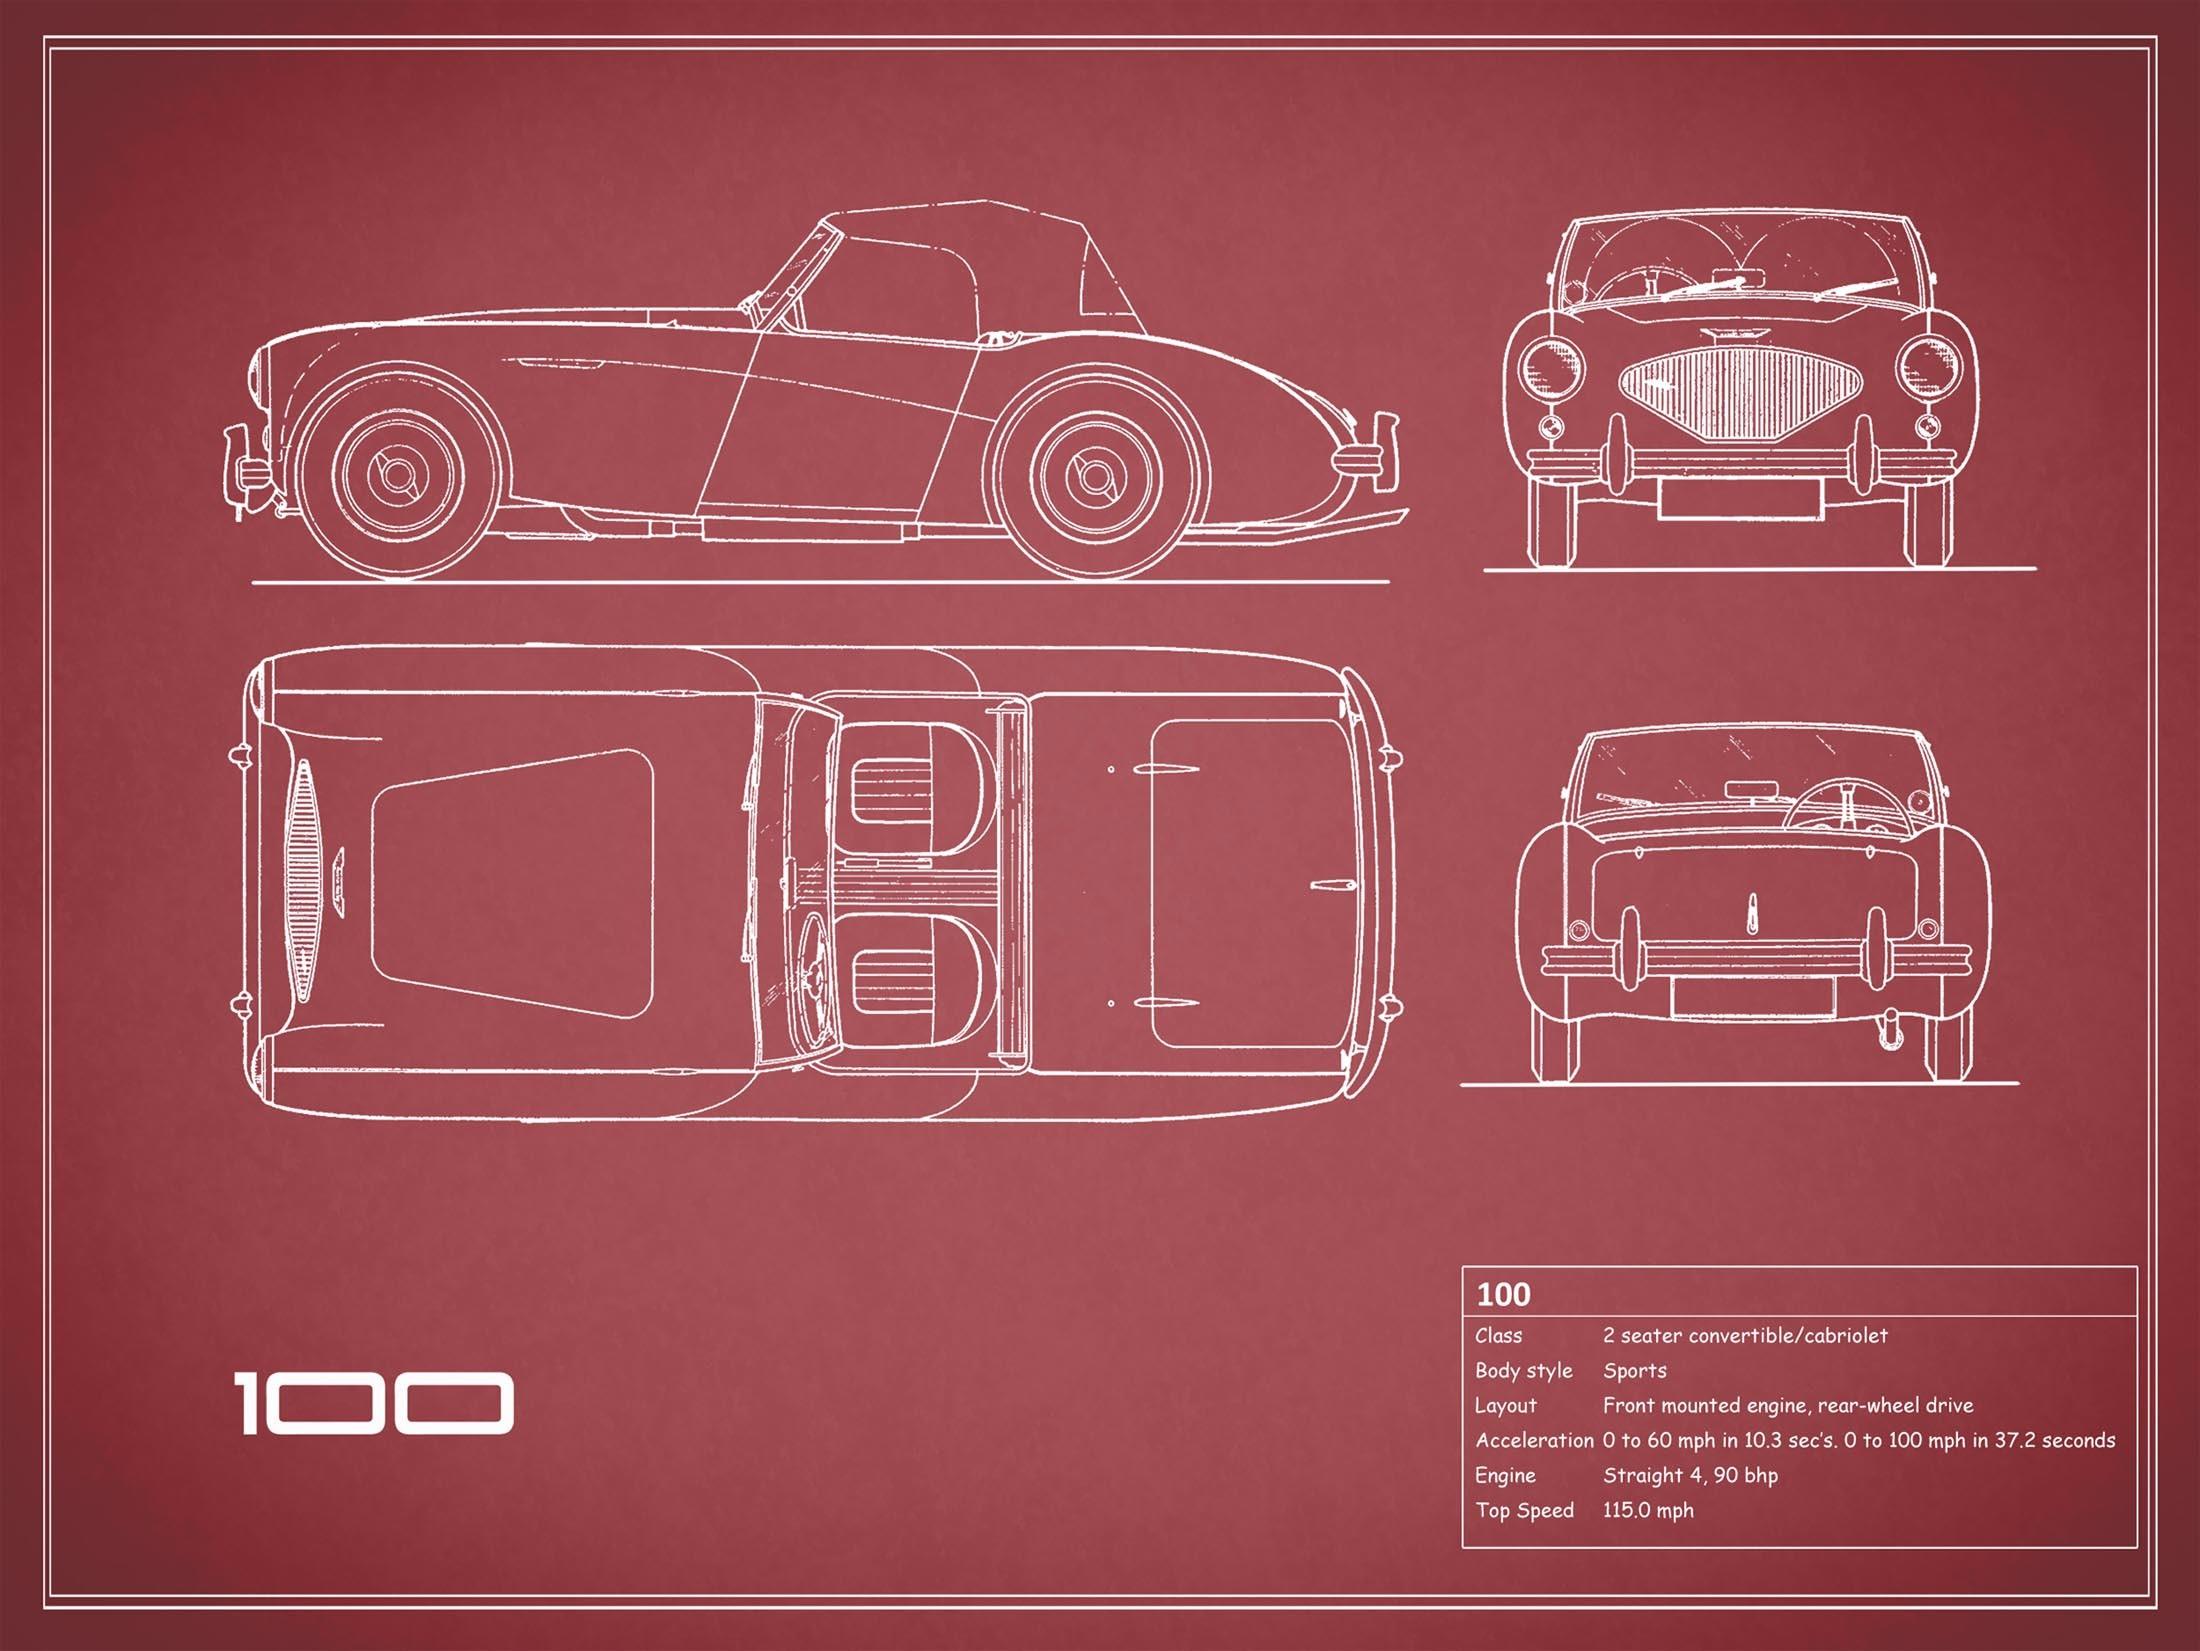 Austin Healey 100 - Red